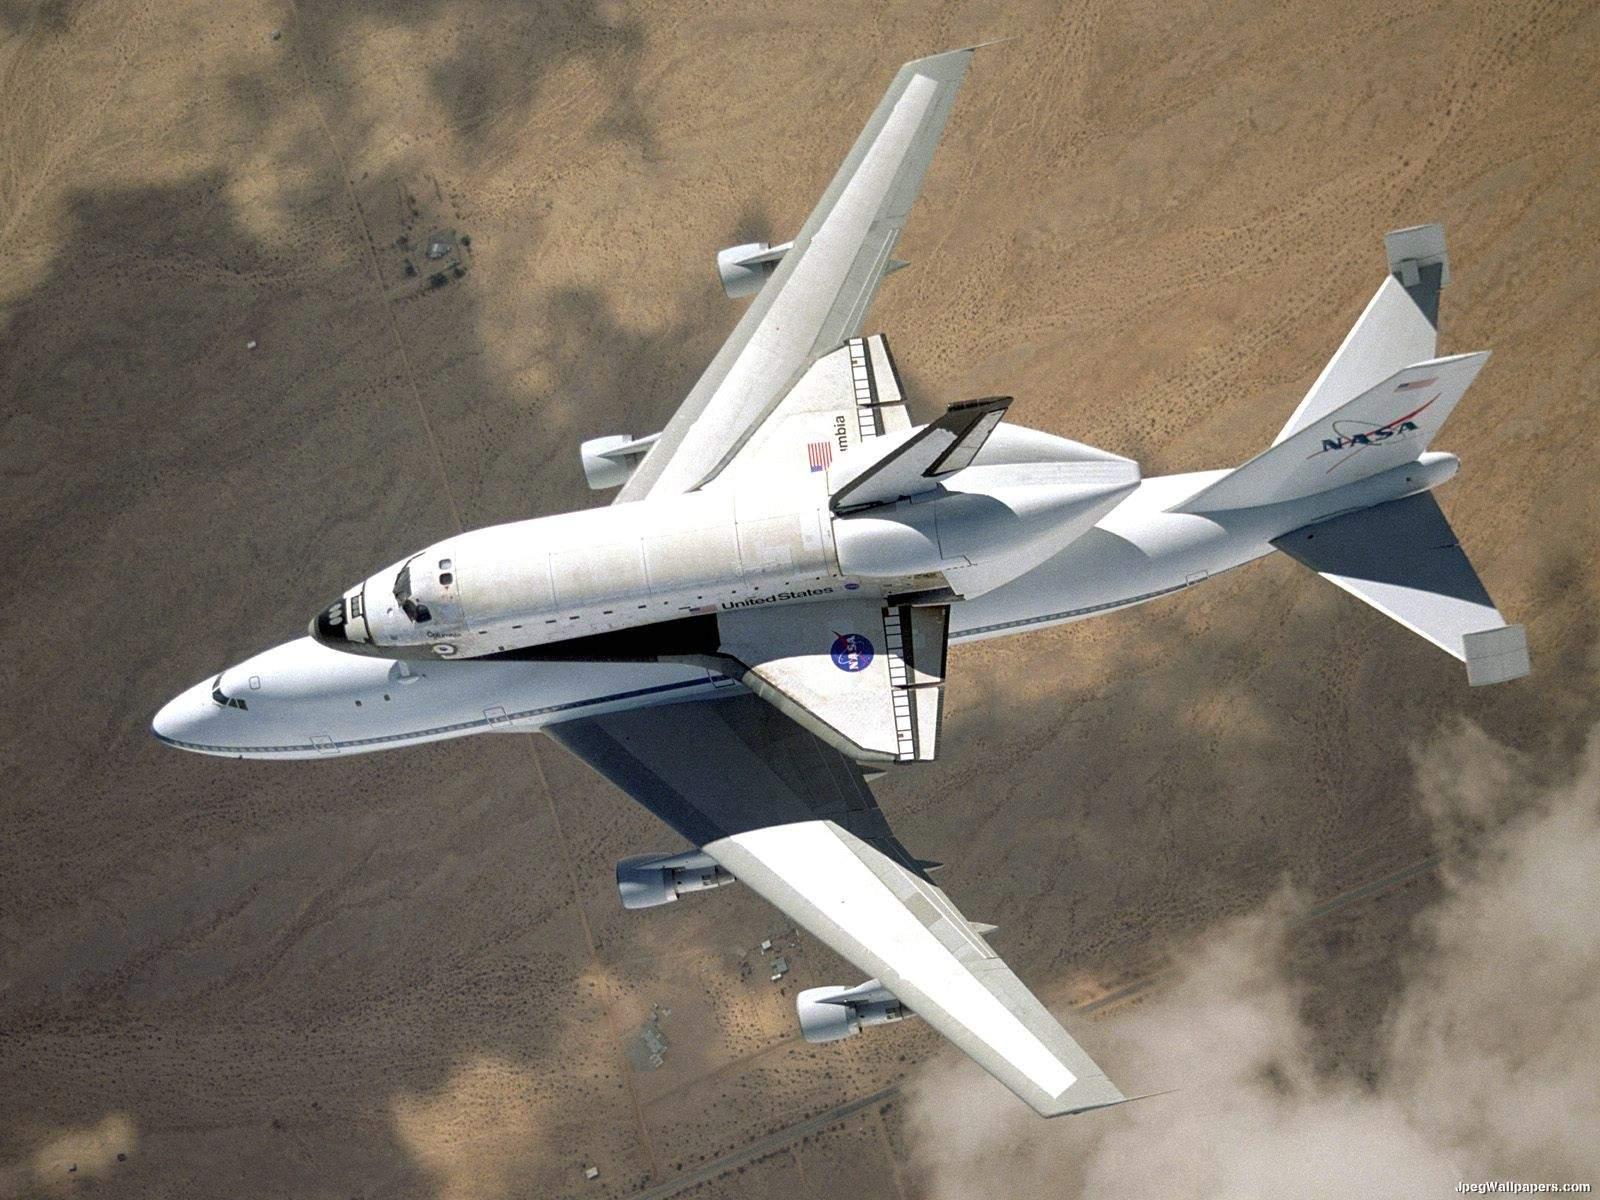 space shuttle columbia wallpaper - photo #14